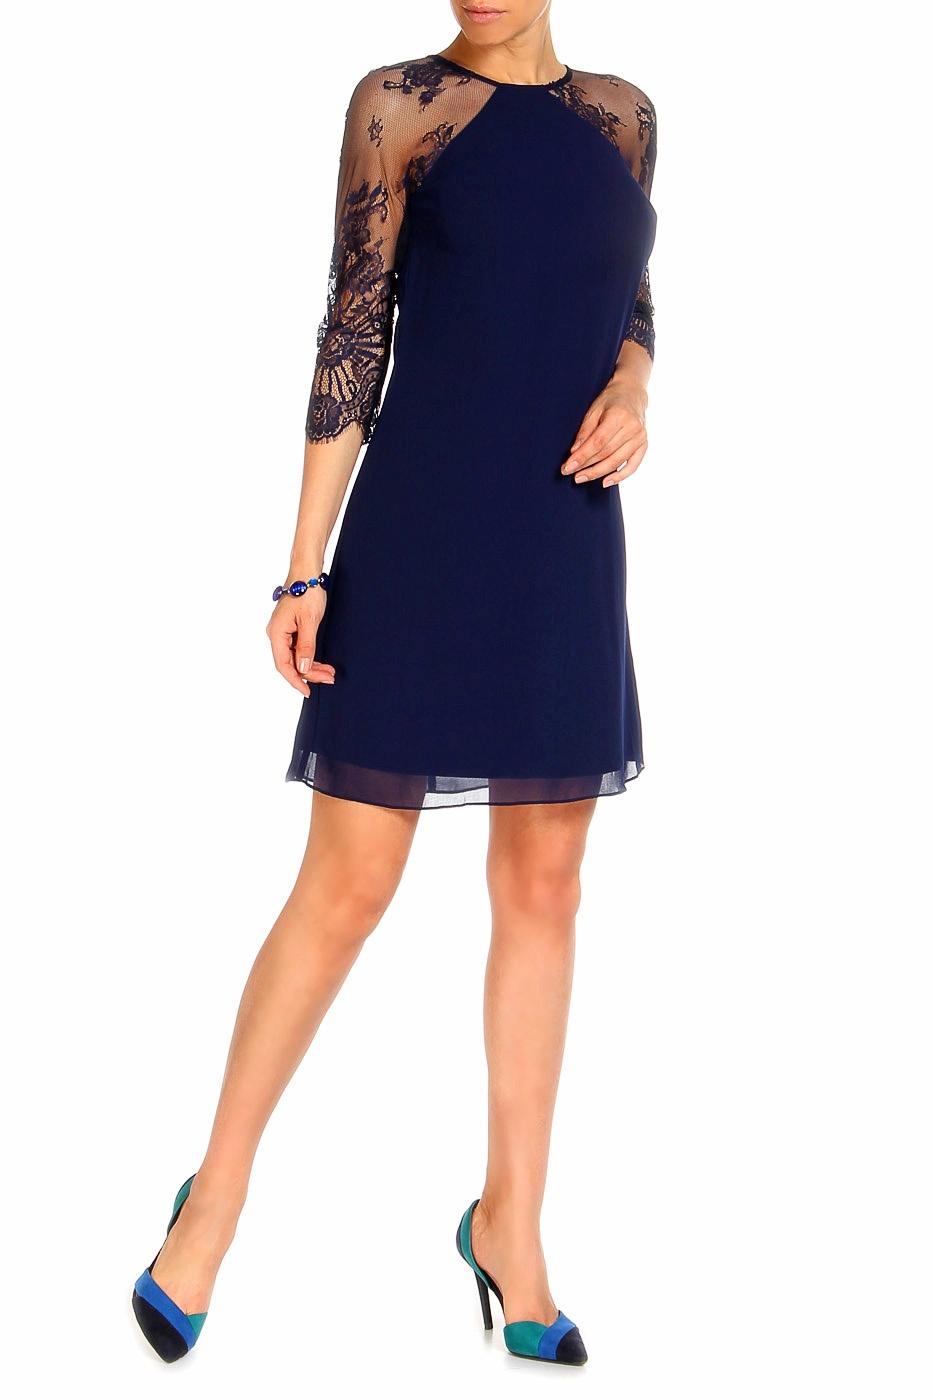 Платье LITTLE MISTR, размер 42-44 рус